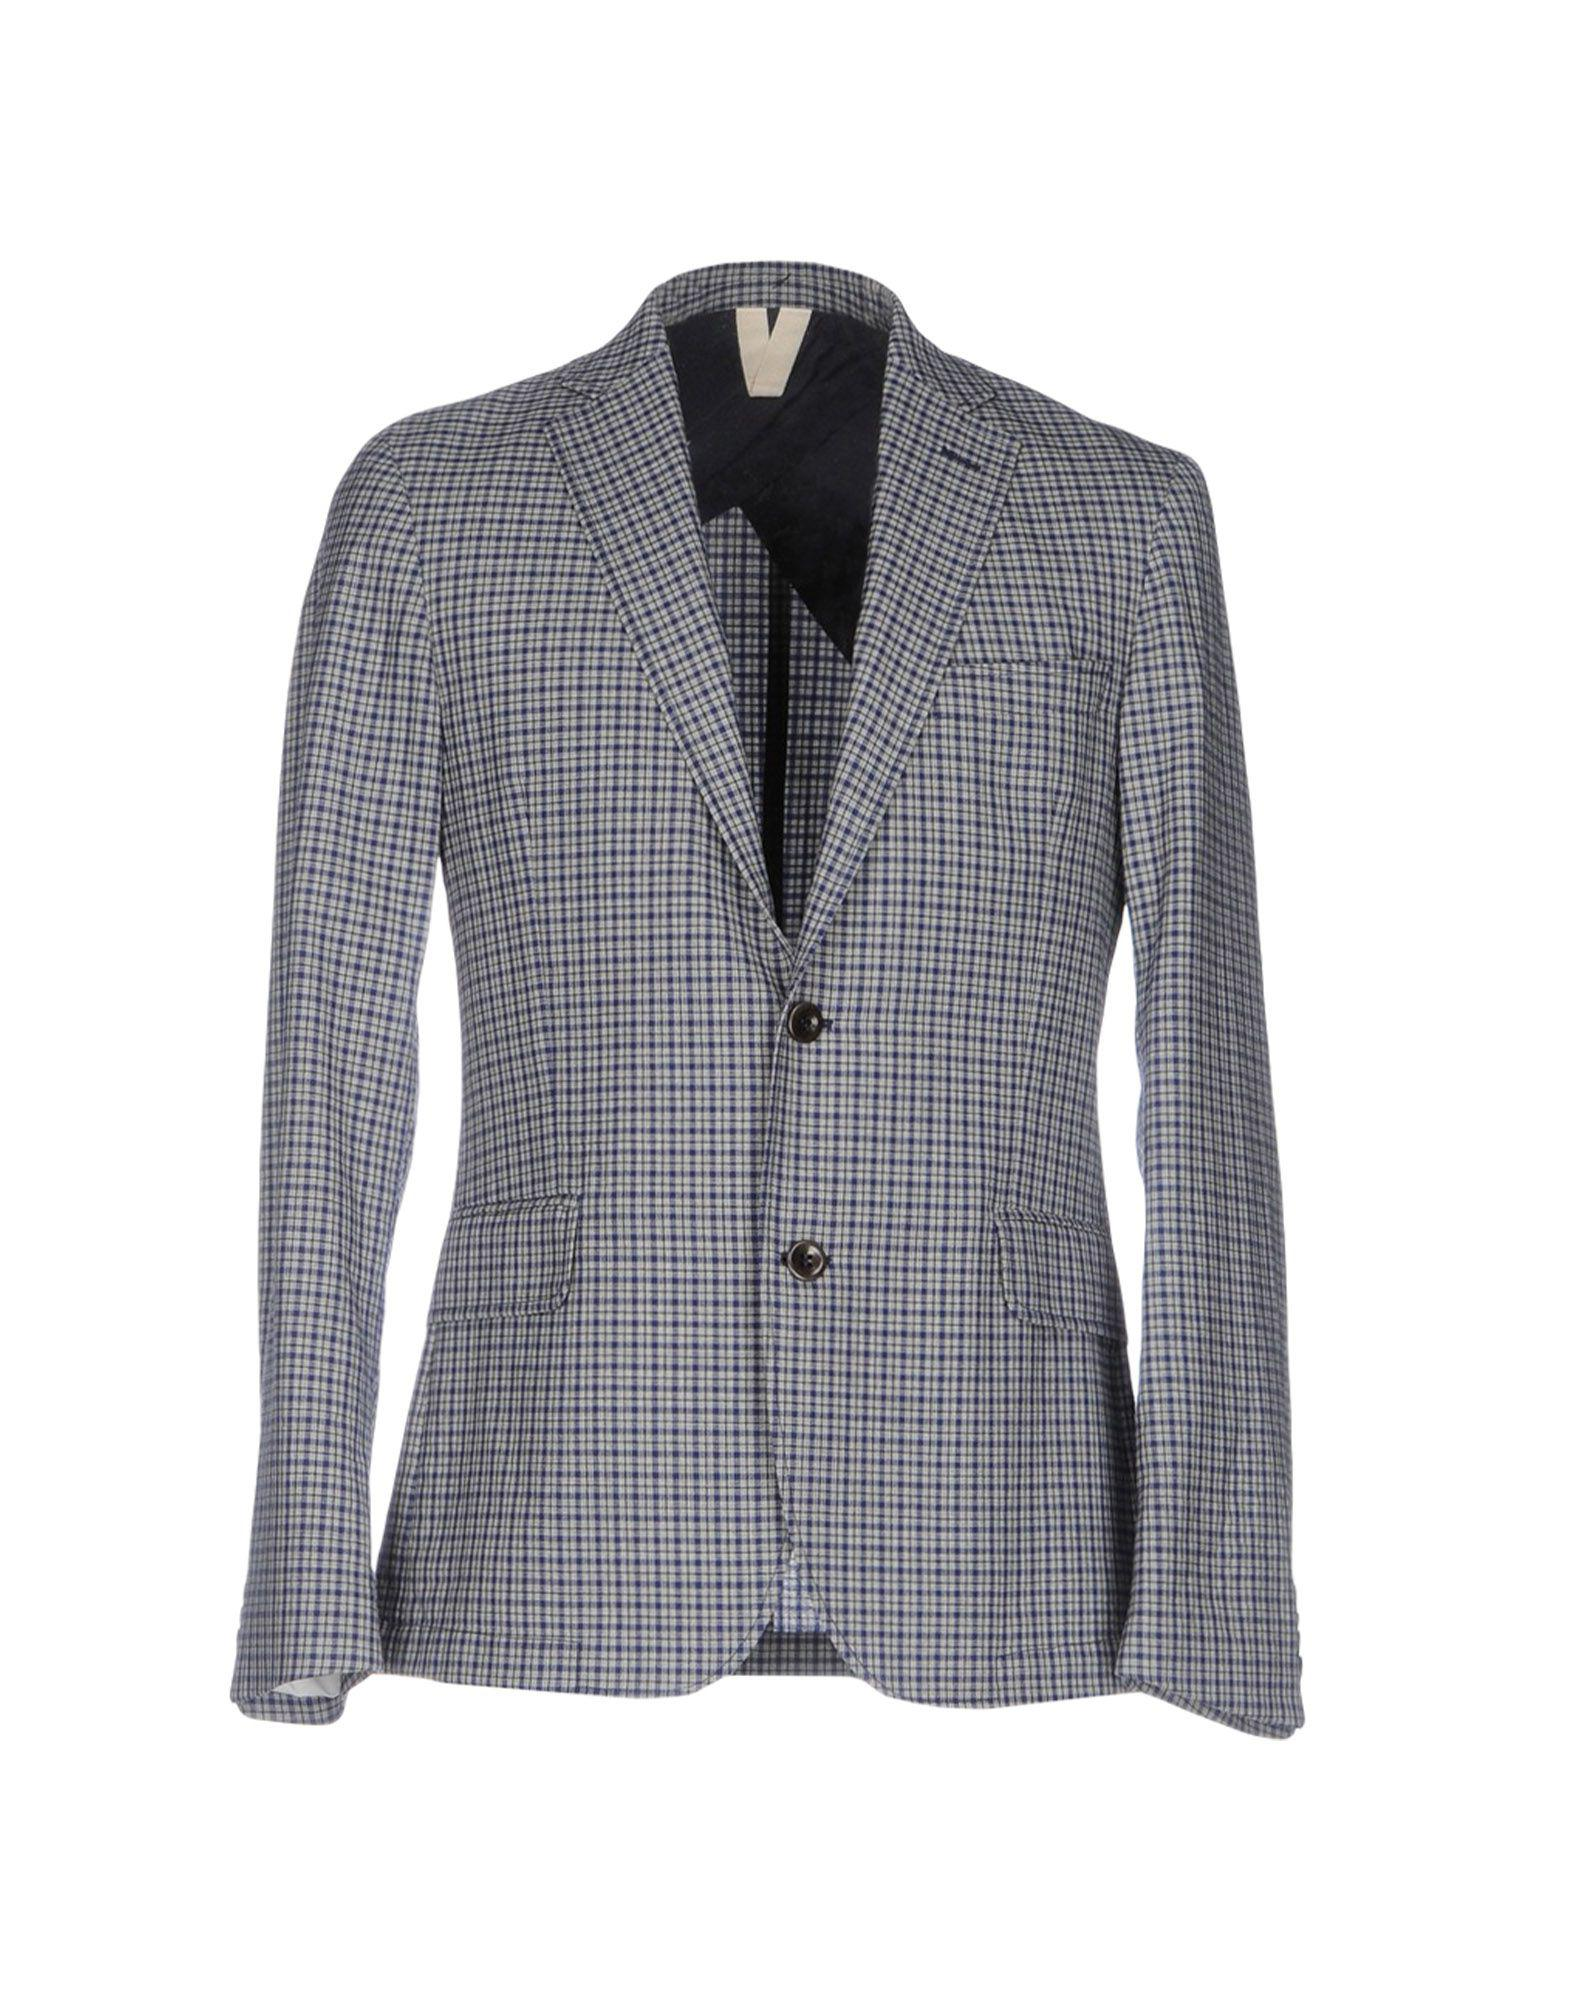 570b657040 Oscar Jacobson Blazer in Gray for Men - Lyst